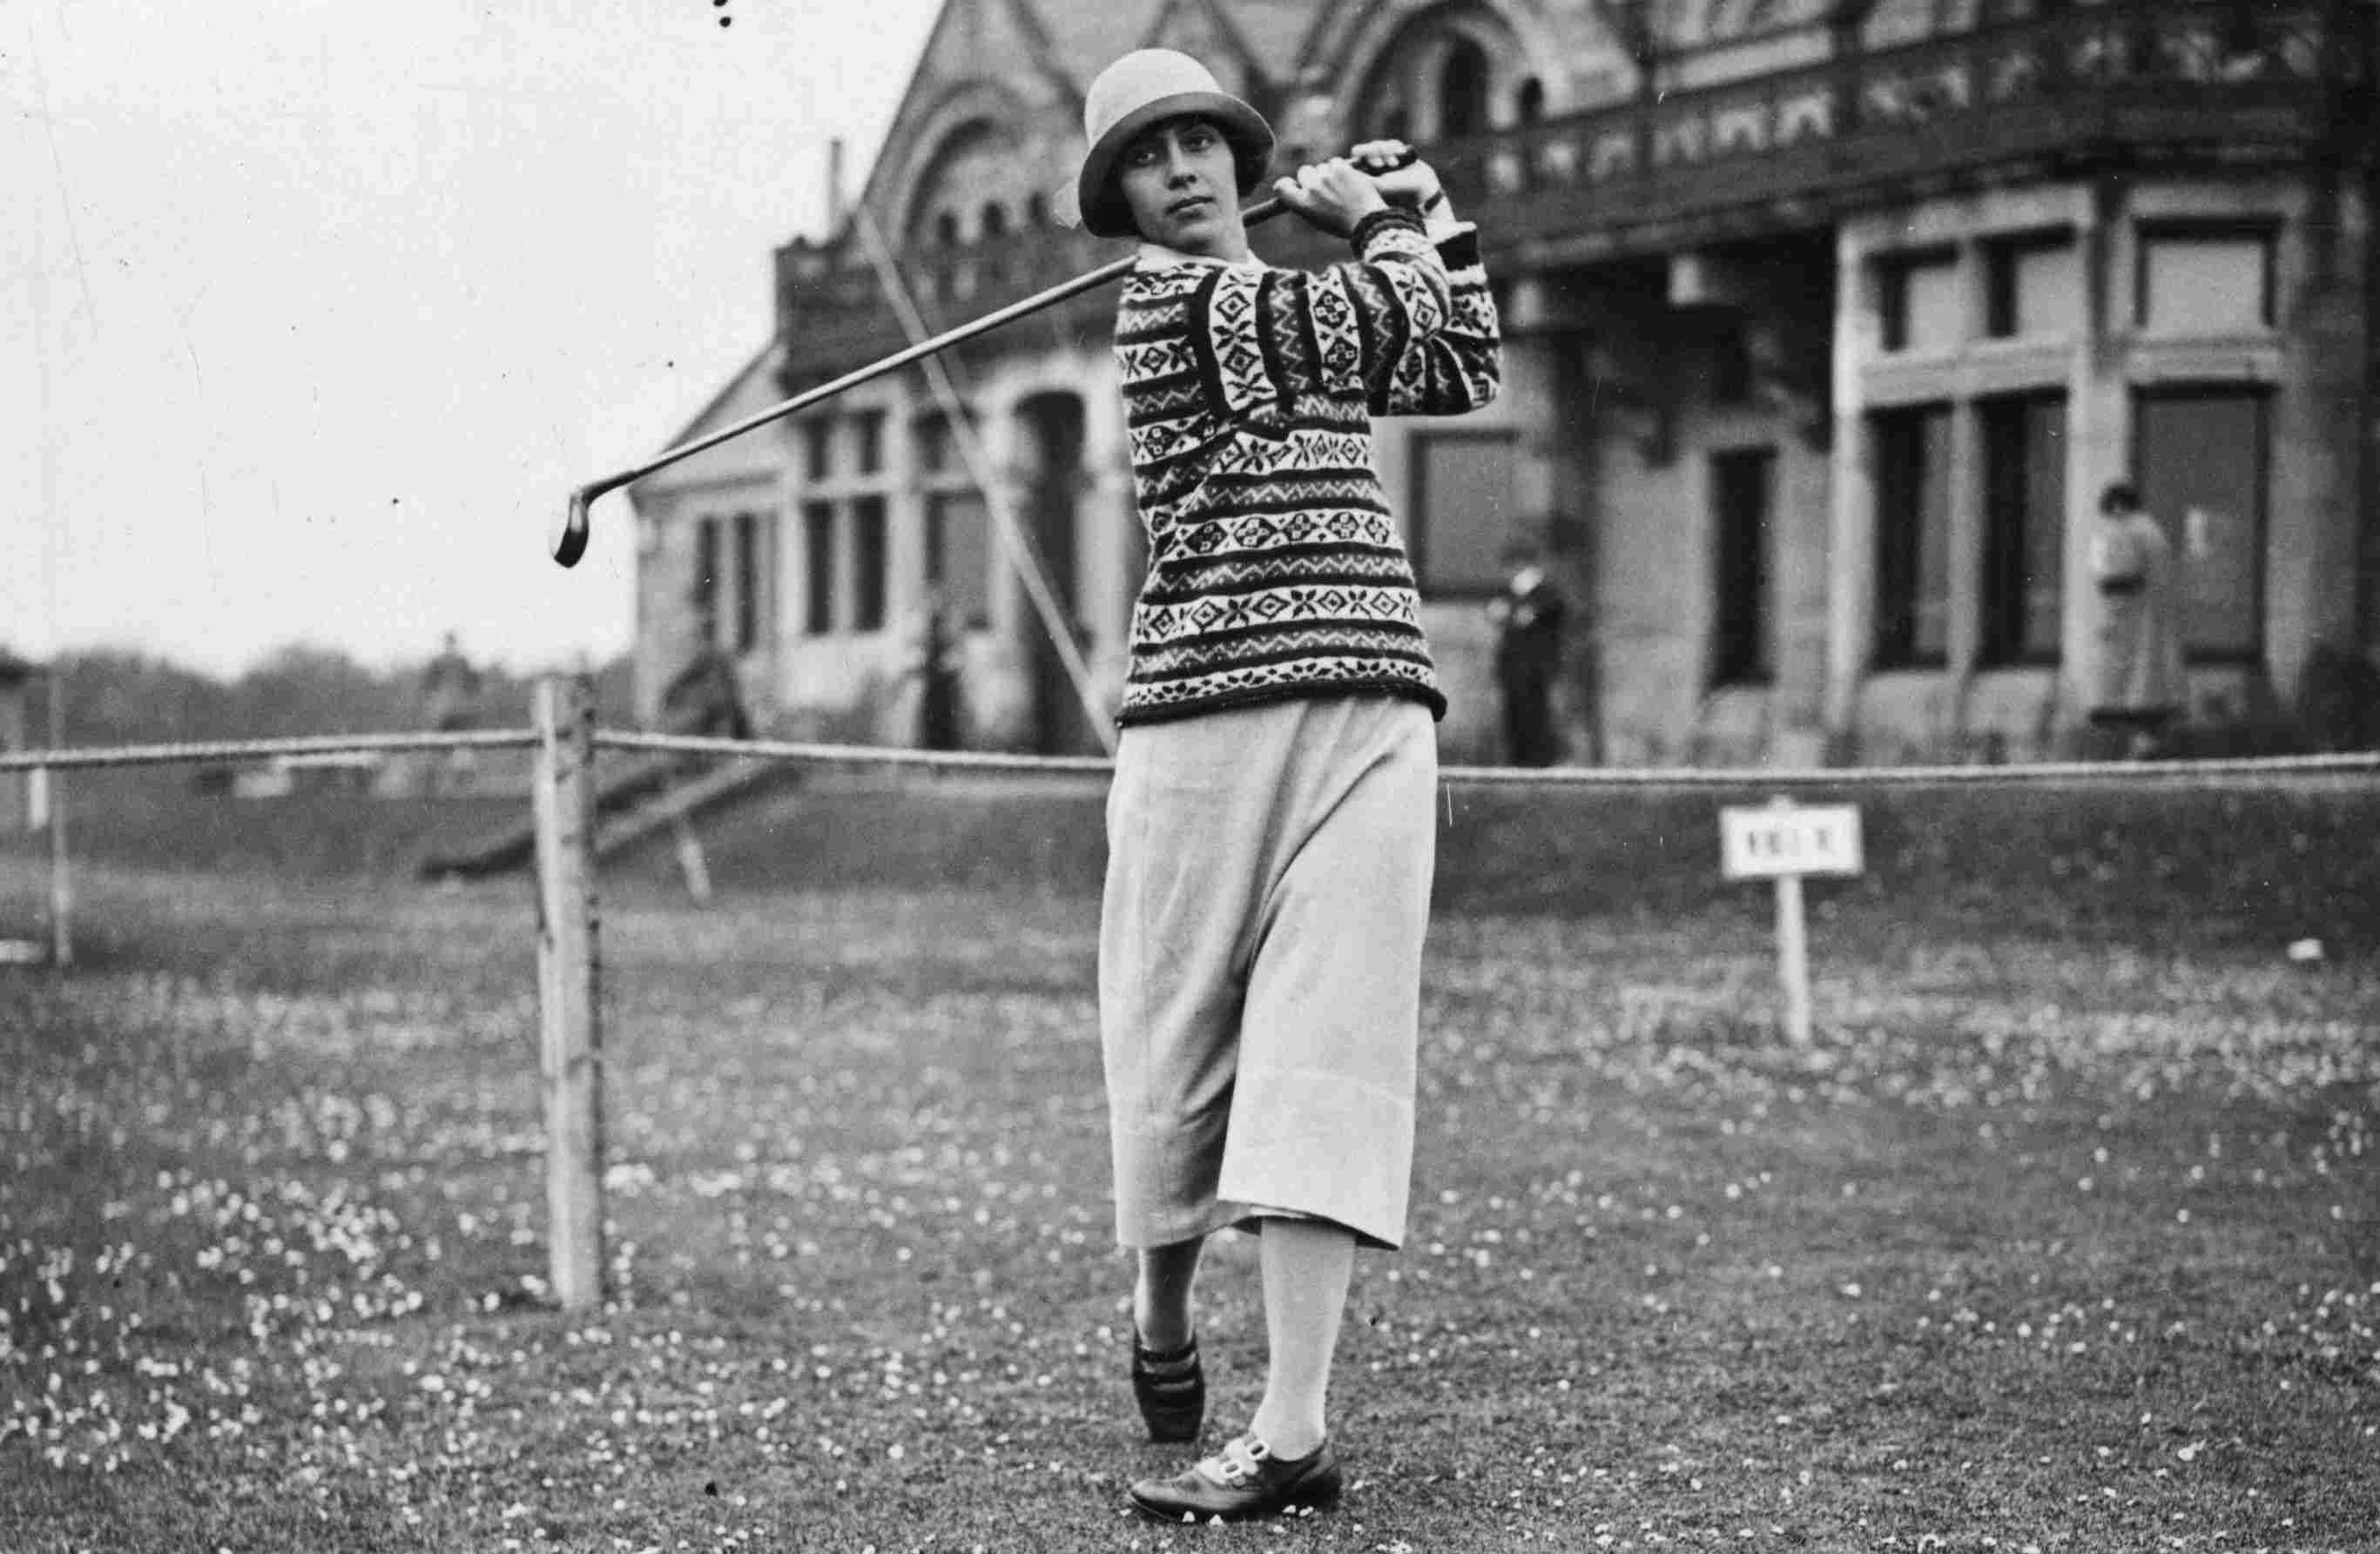 Golfer Glenna Collett Vare pictured in 1925.